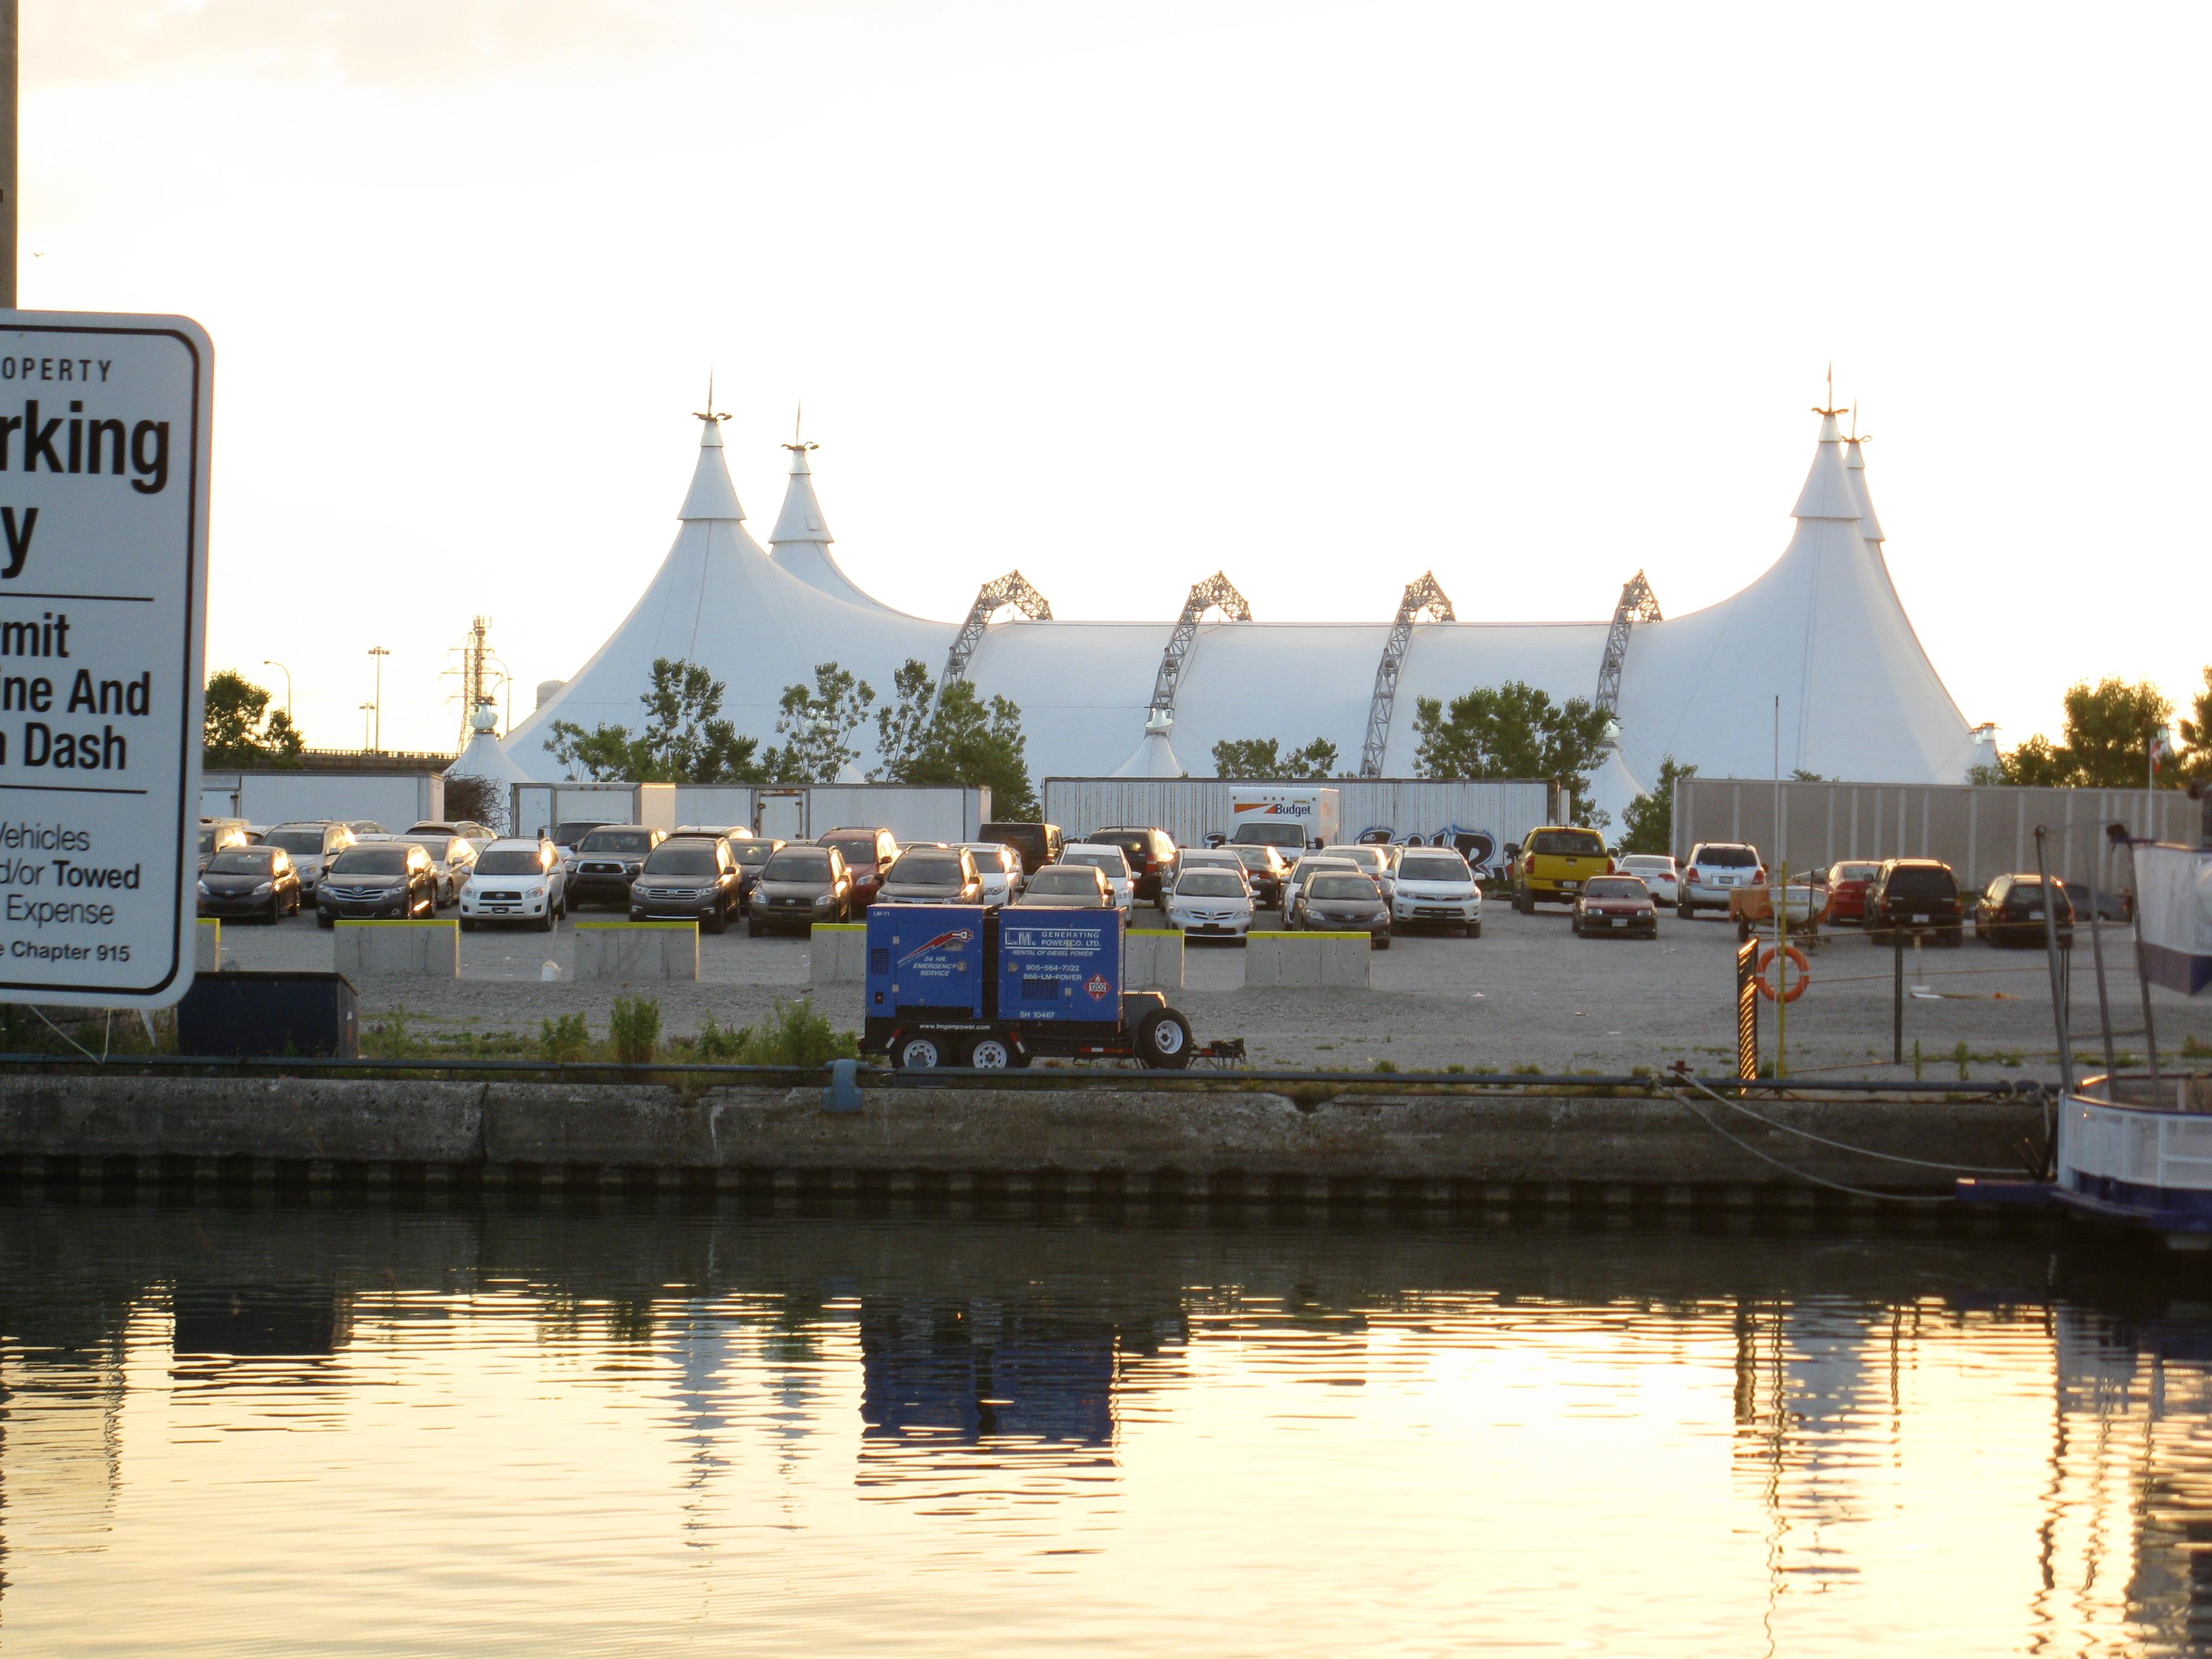 Cavalia Odysseo, shortly after sunrise, 2012 07 06 -c.jpg, Landscape, Outdoor, River, Ship, HQ Photo